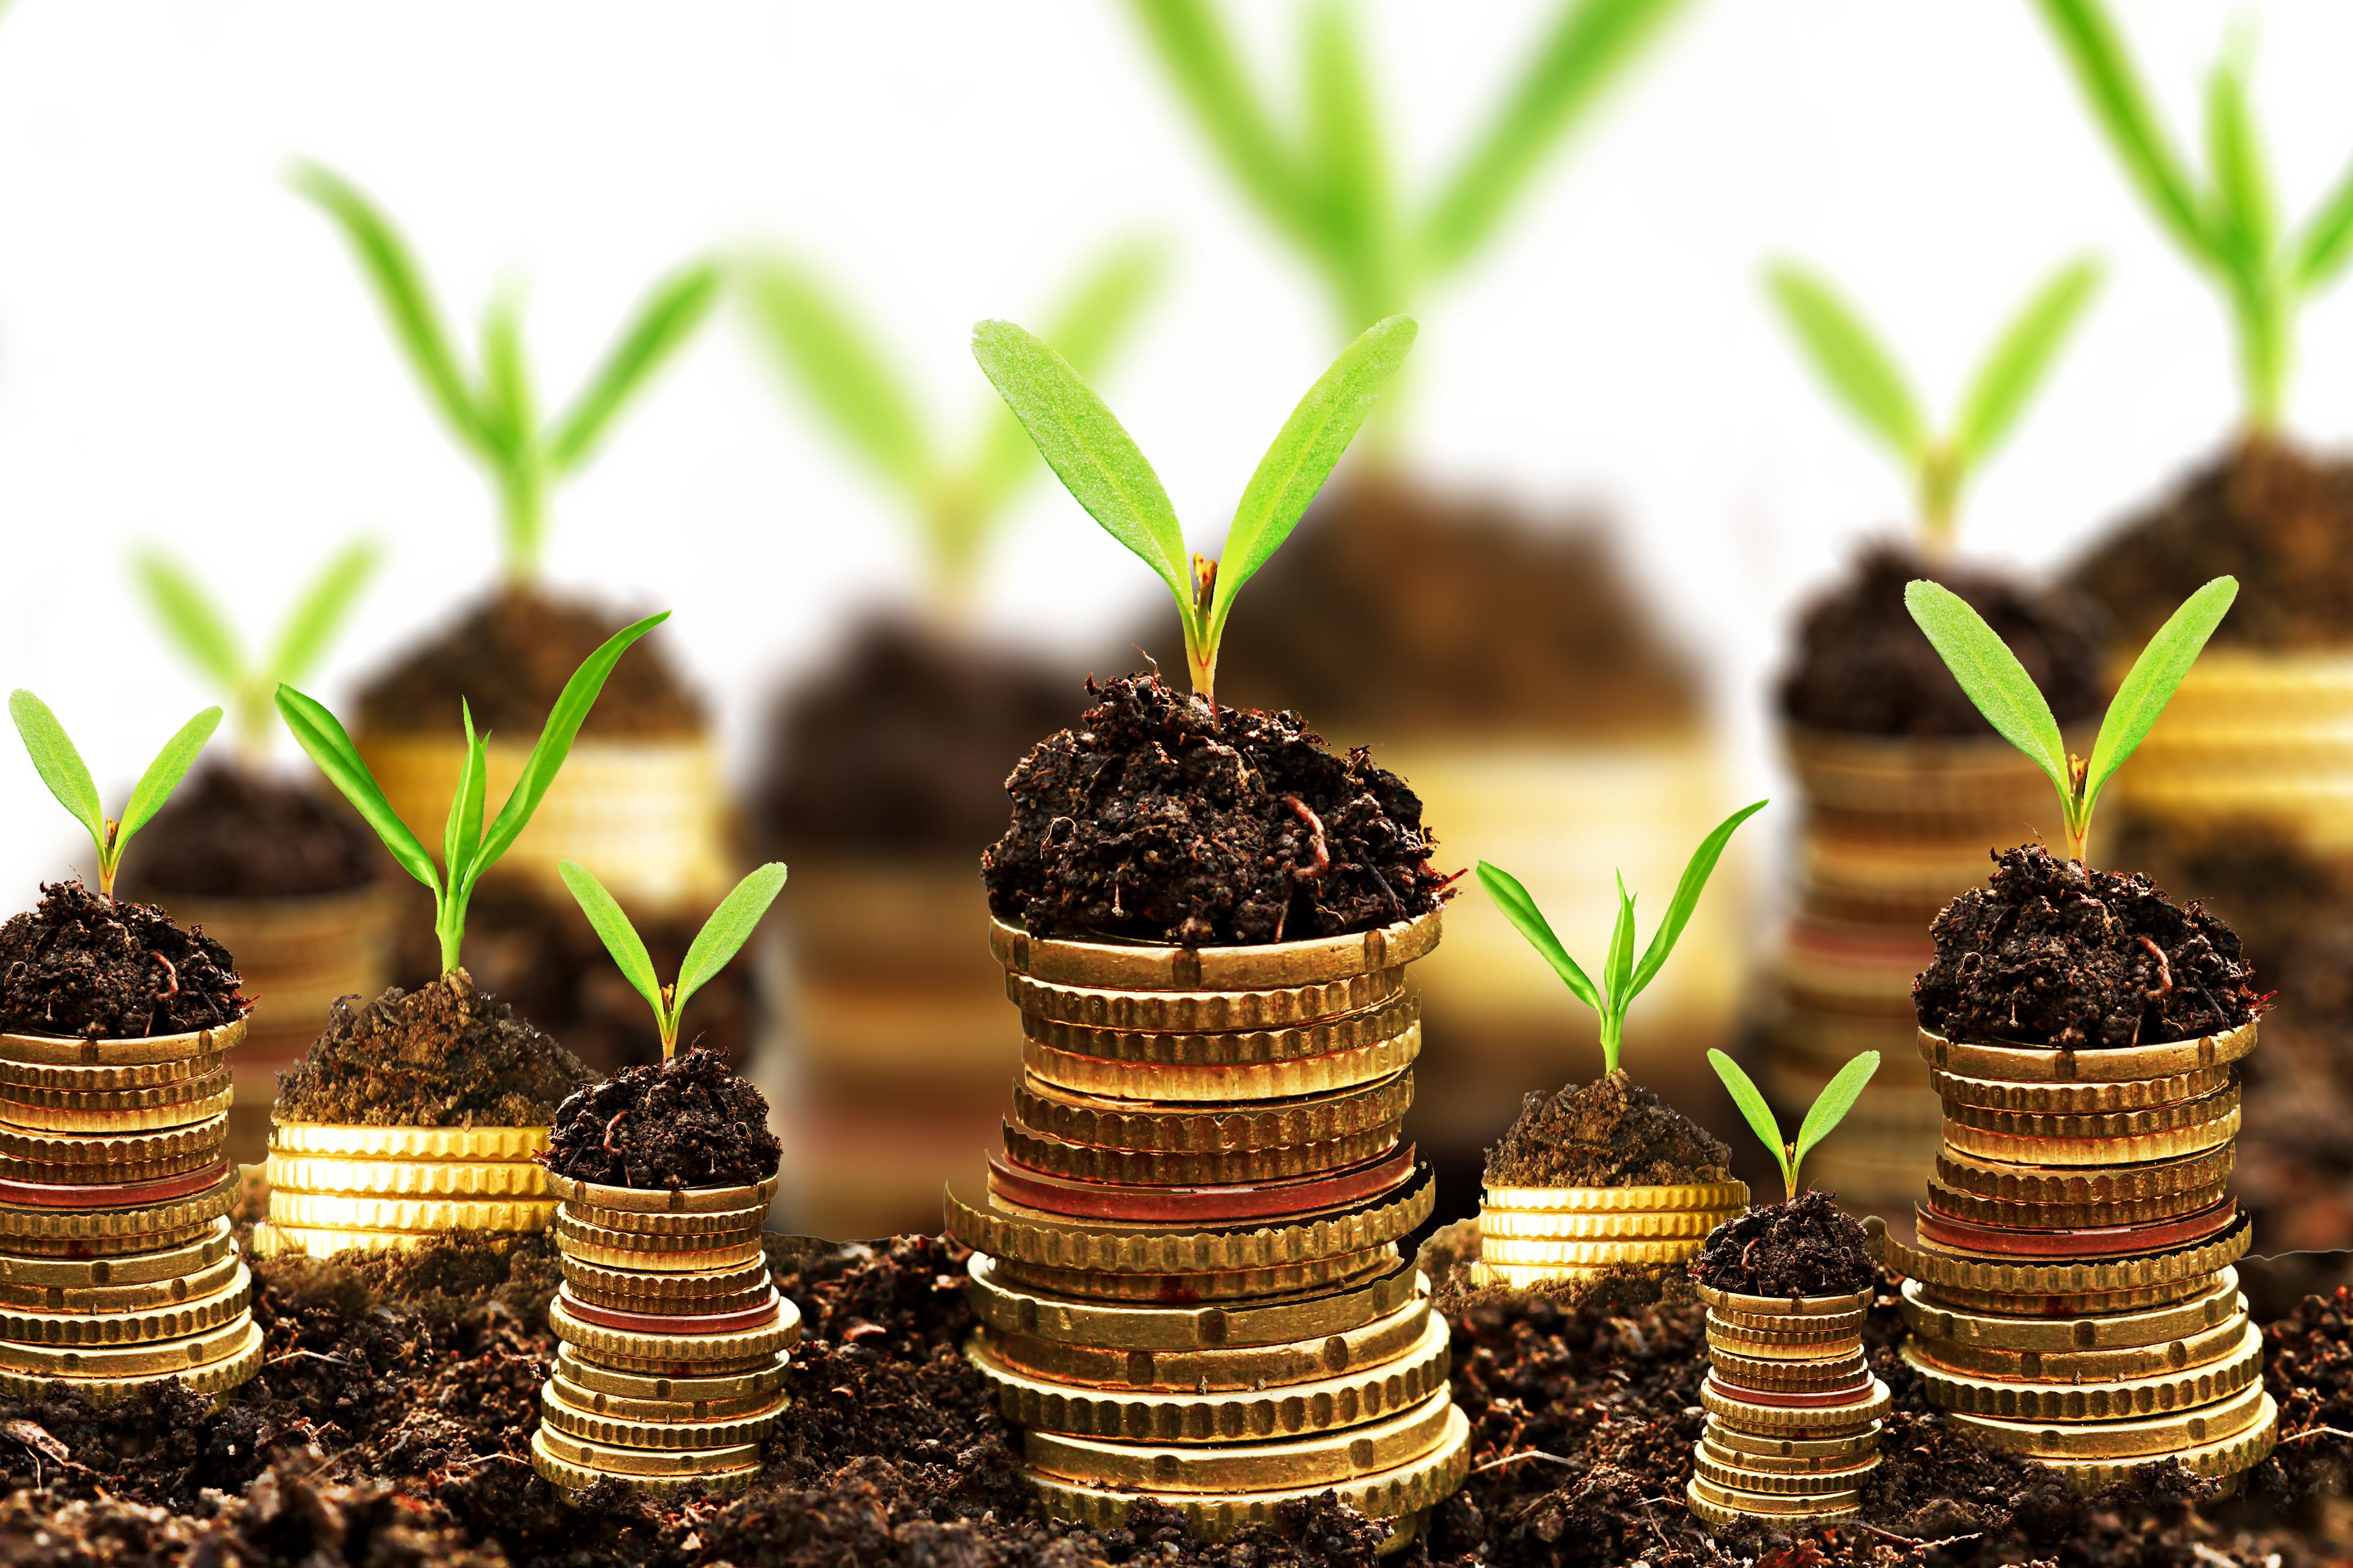 Money Growth Photo